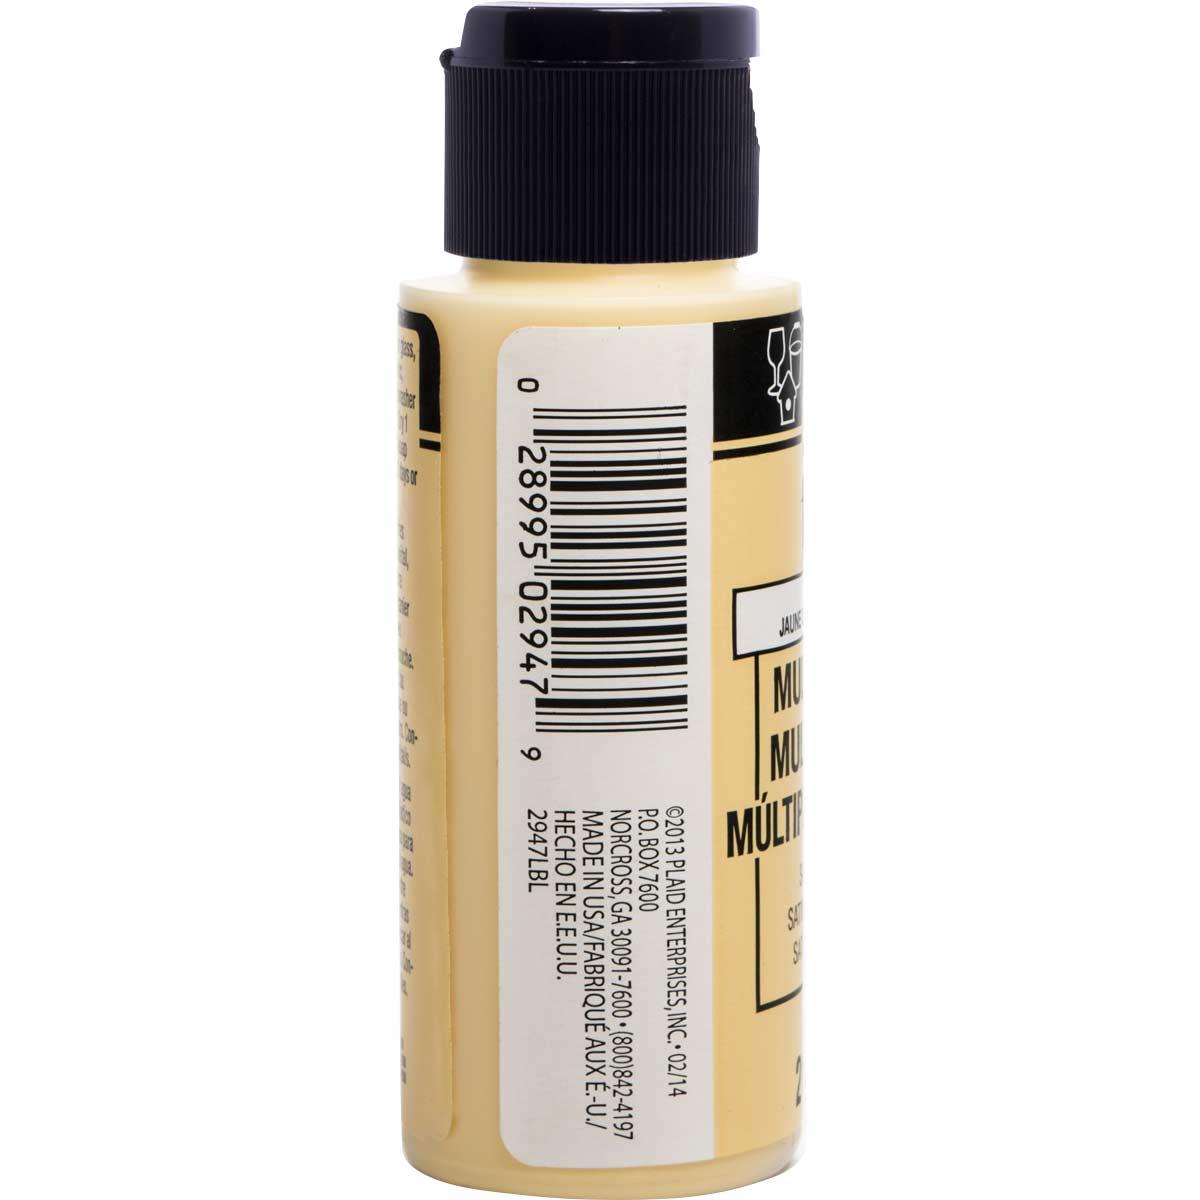 FolkArt ® Multi-Surface Satin Acrylic Paints - Sunflower, 2 oz. - 2947